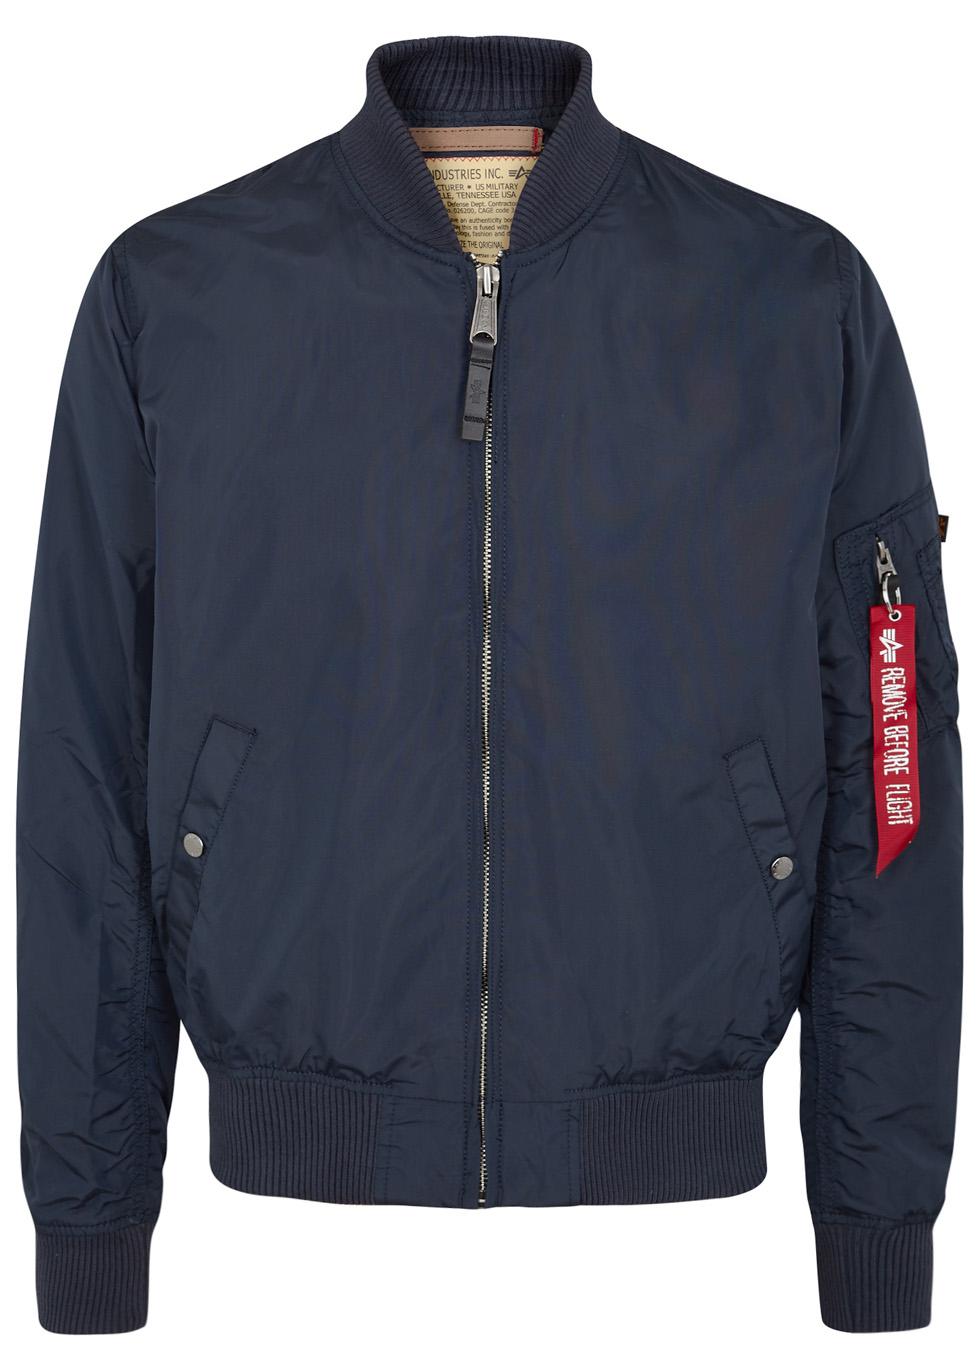 MA1-TT blue shell bomber jacket - Alpha Industries